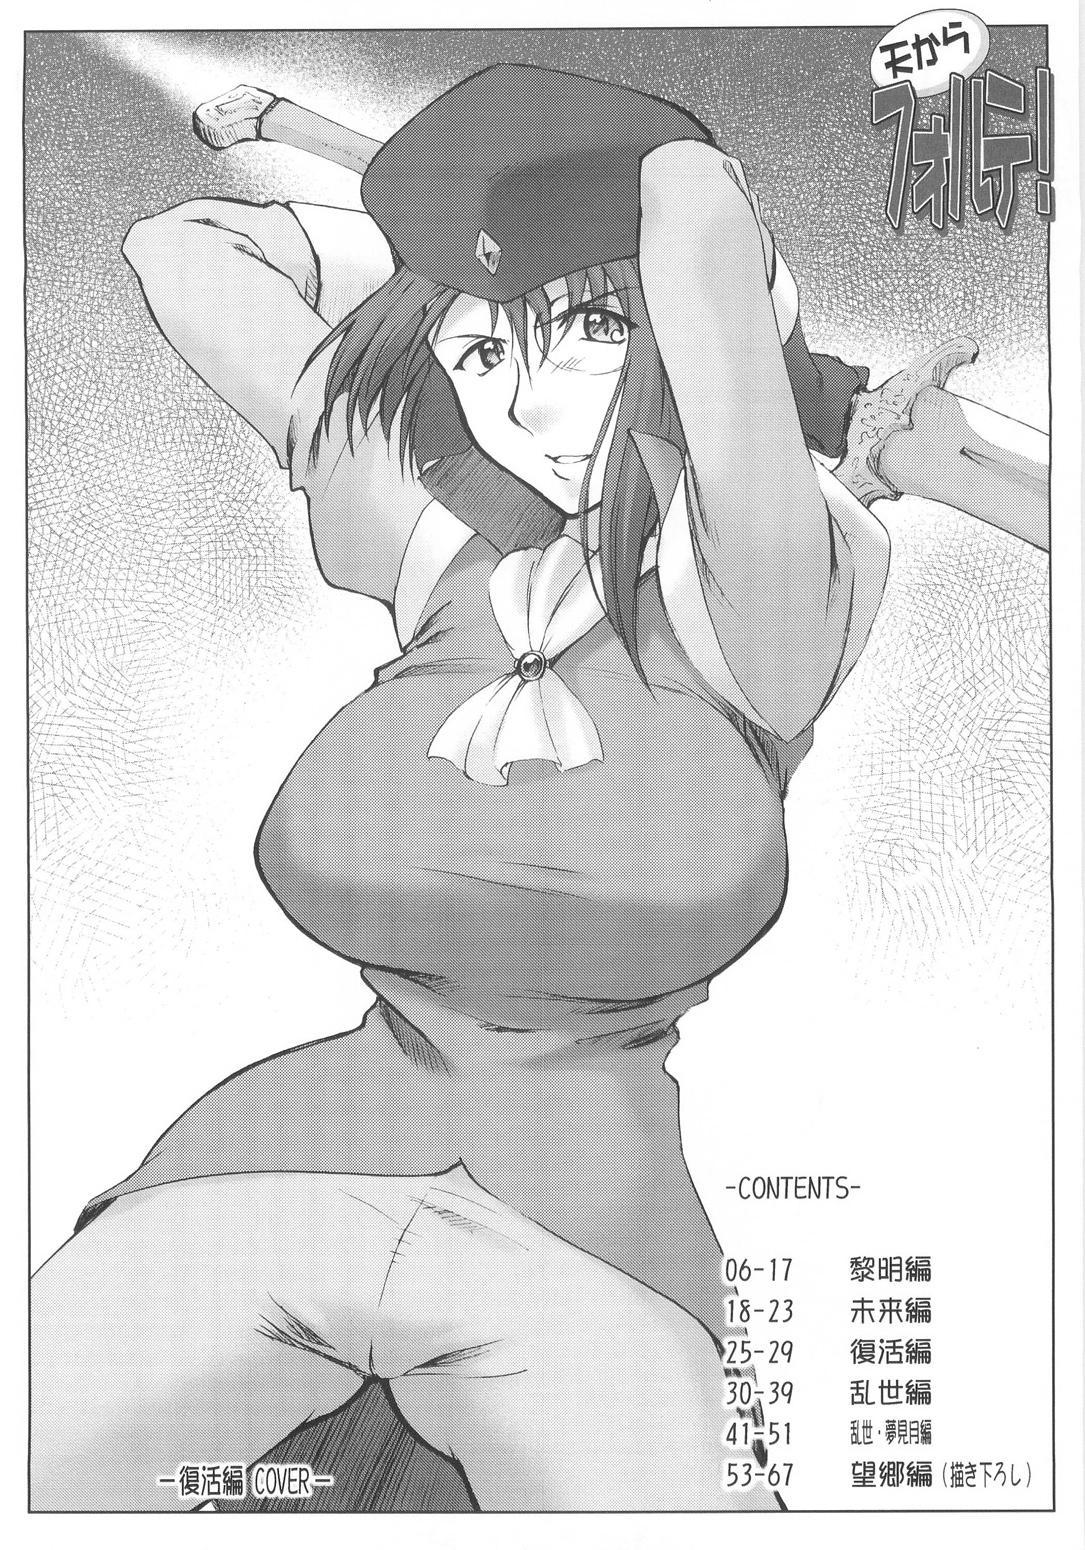 (CR37) [Sago-Jou (Seura Isago)] Ten Kara Forte! ~Soushuuhen~   Forte from Heaven! (Galaxy Angel) [English] [SaHa] 2